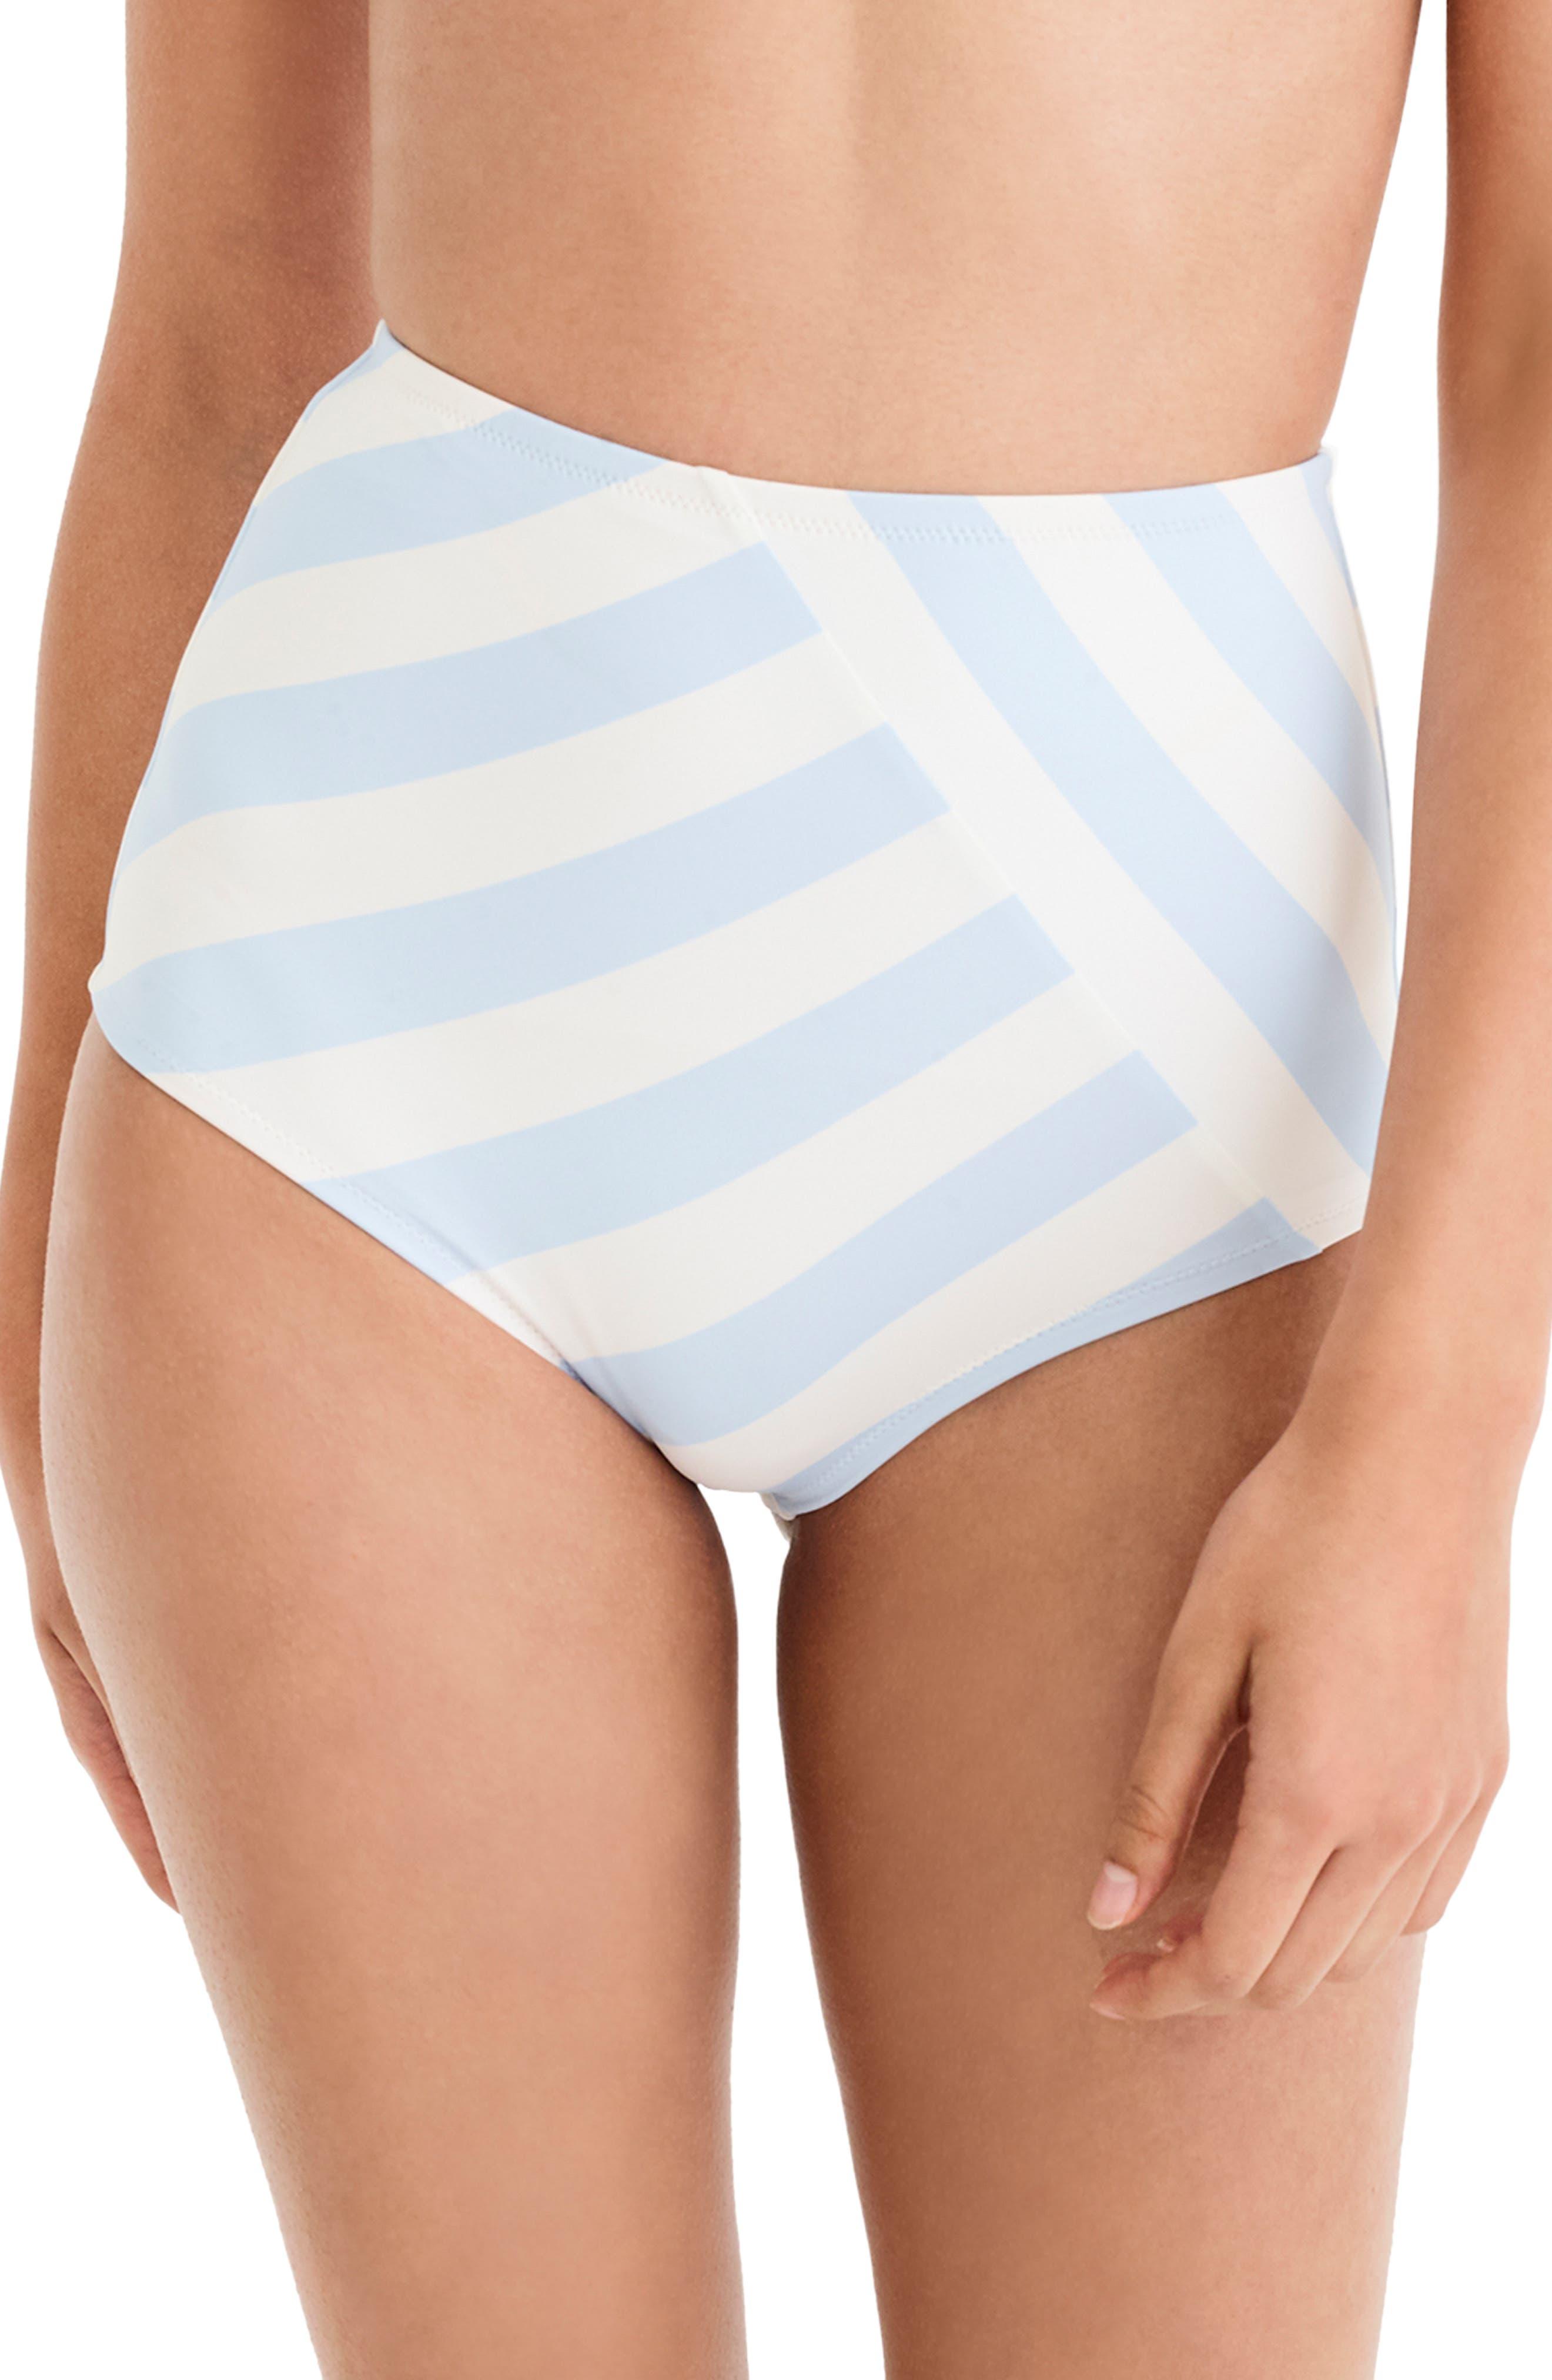 J.CREW Stripe Seamless High Waist Bikini Bottoms, Main, color, 400